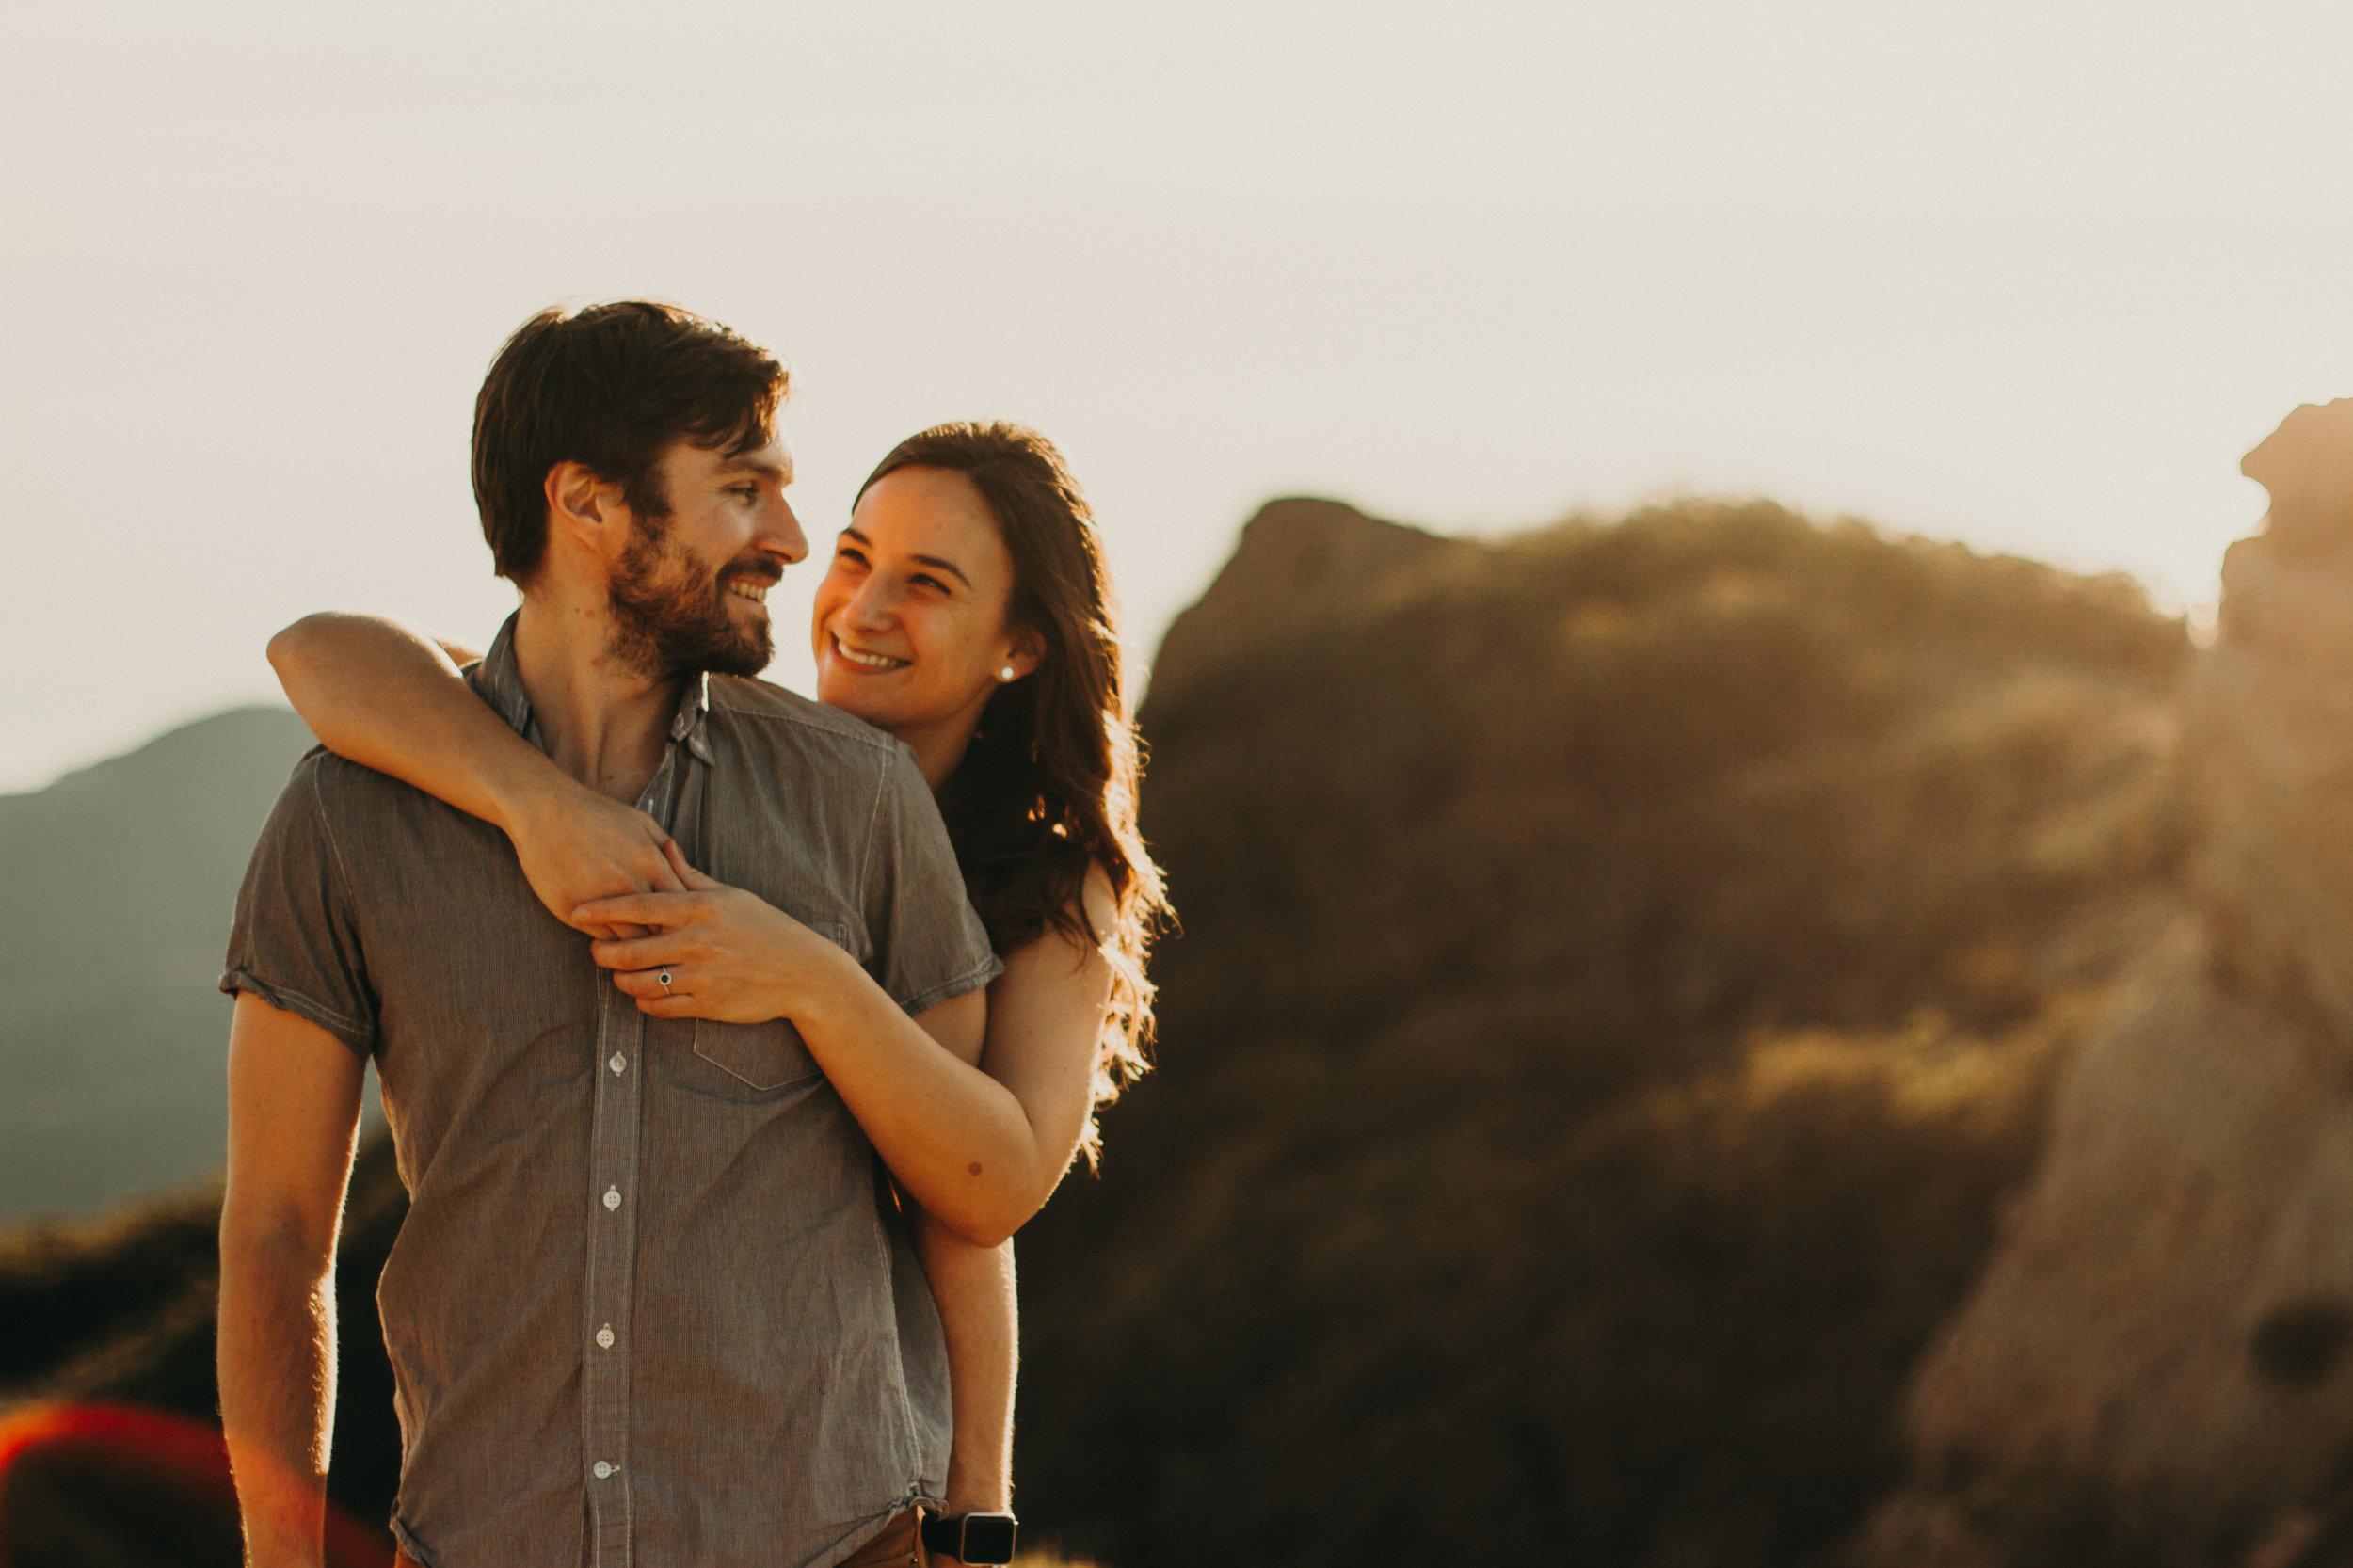 MEGAN + GABE - Sunset engagement in the Santa Monica Mountains